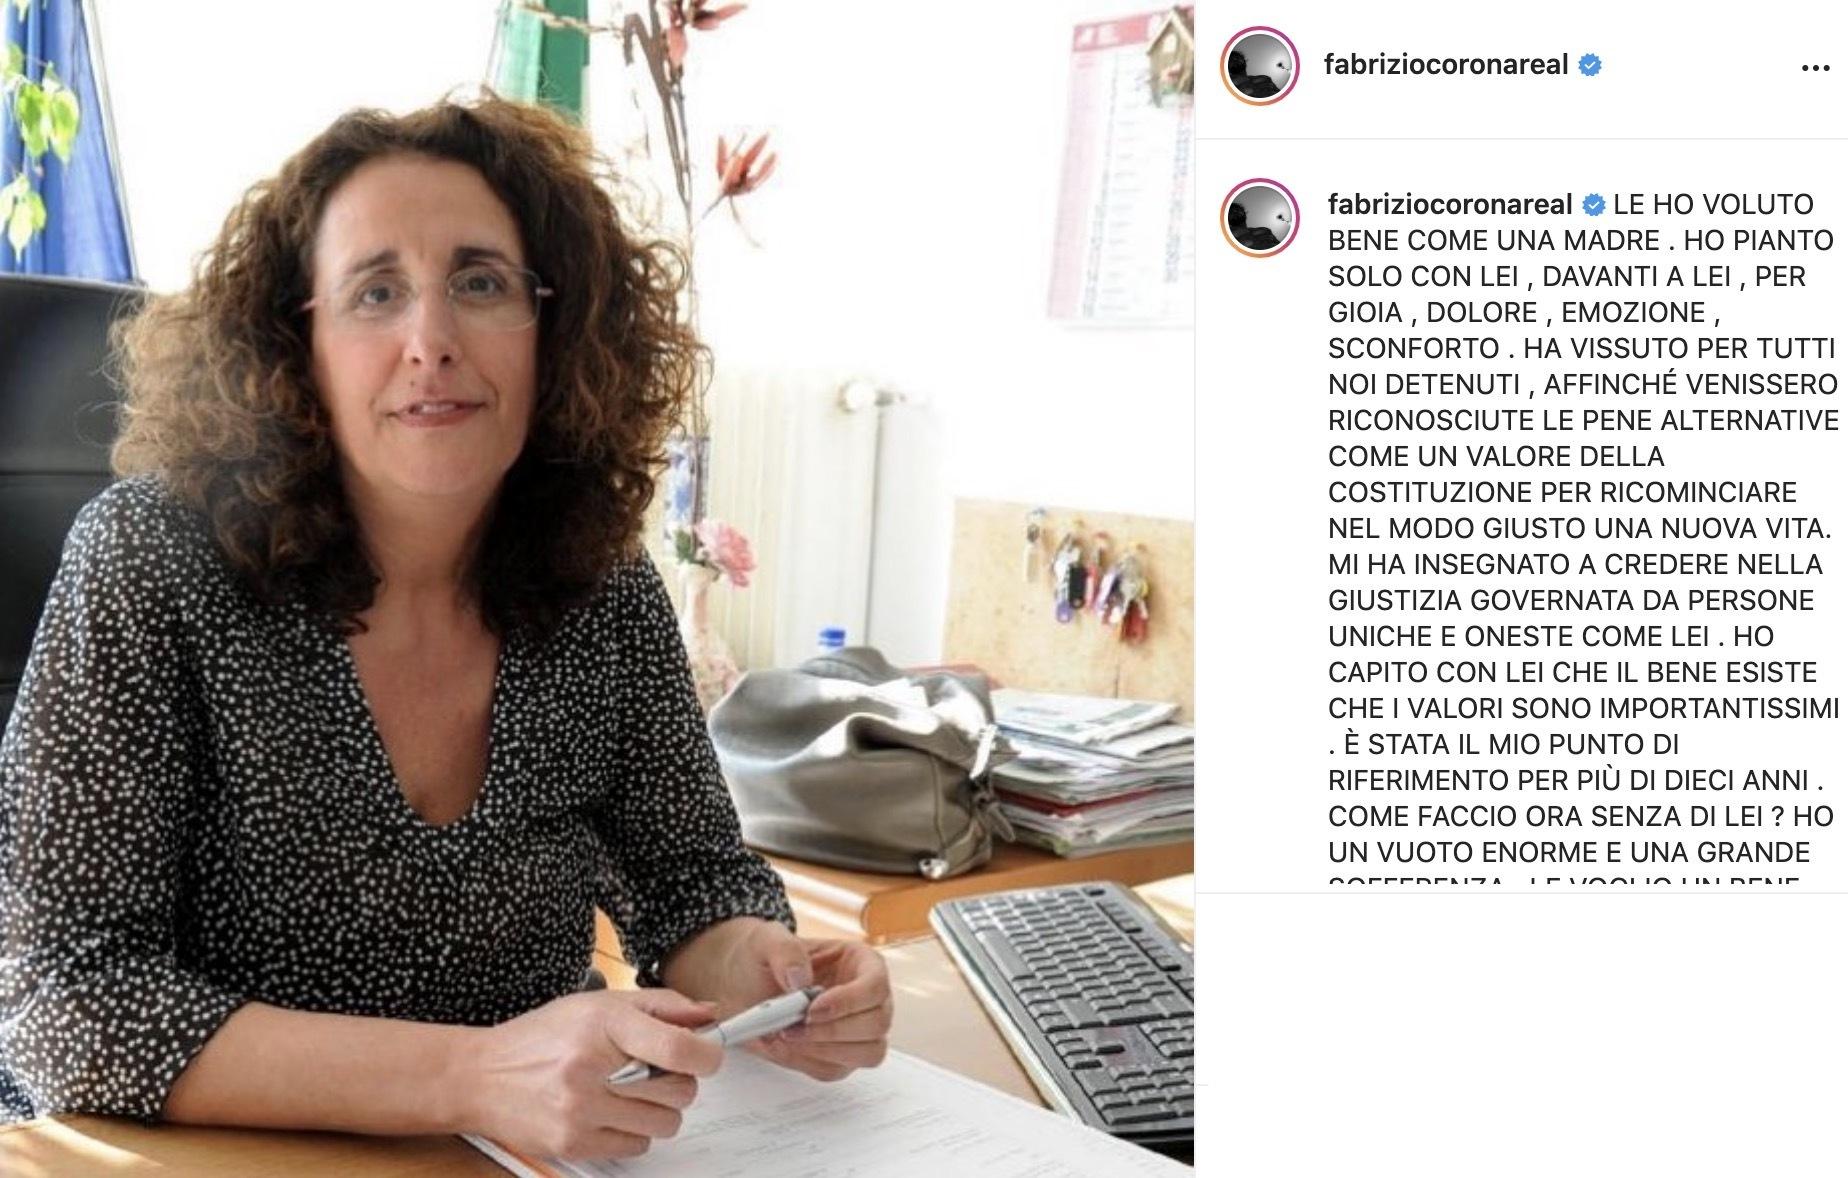 fabrizio corona severina panarello instagram-2